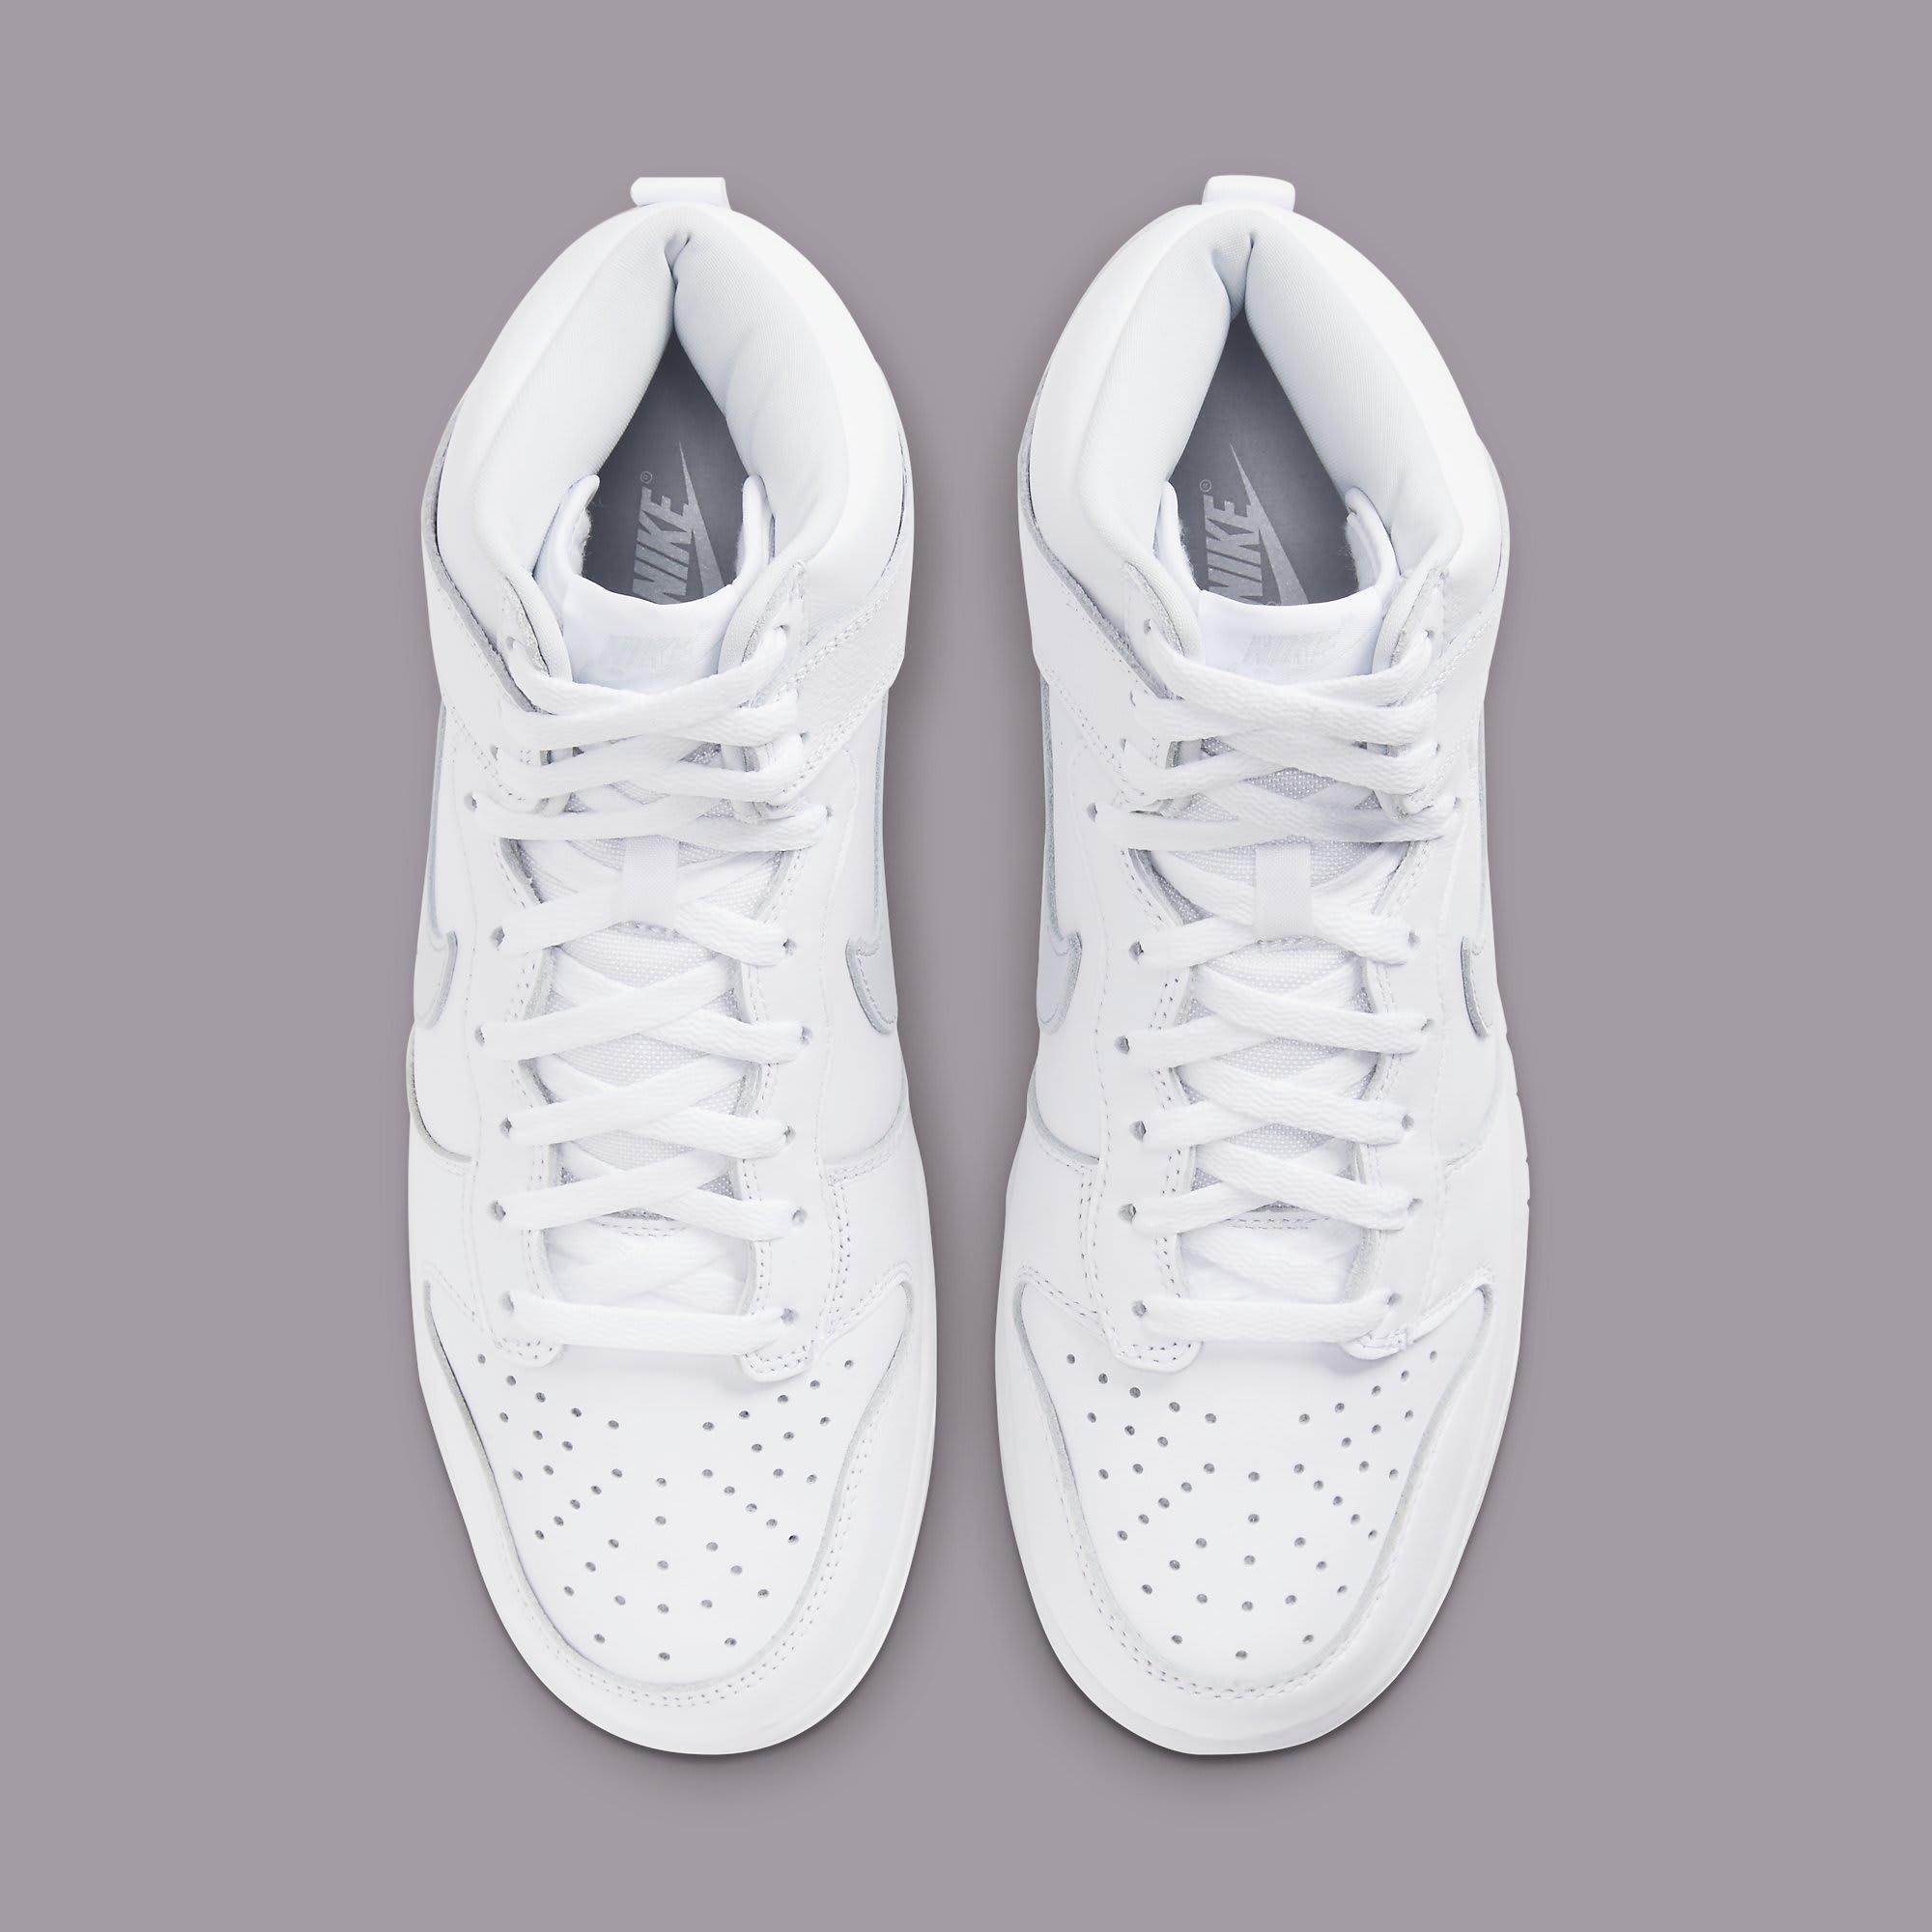 Nike Dunk High 'Pure Platinum' CZ8149-101 Top